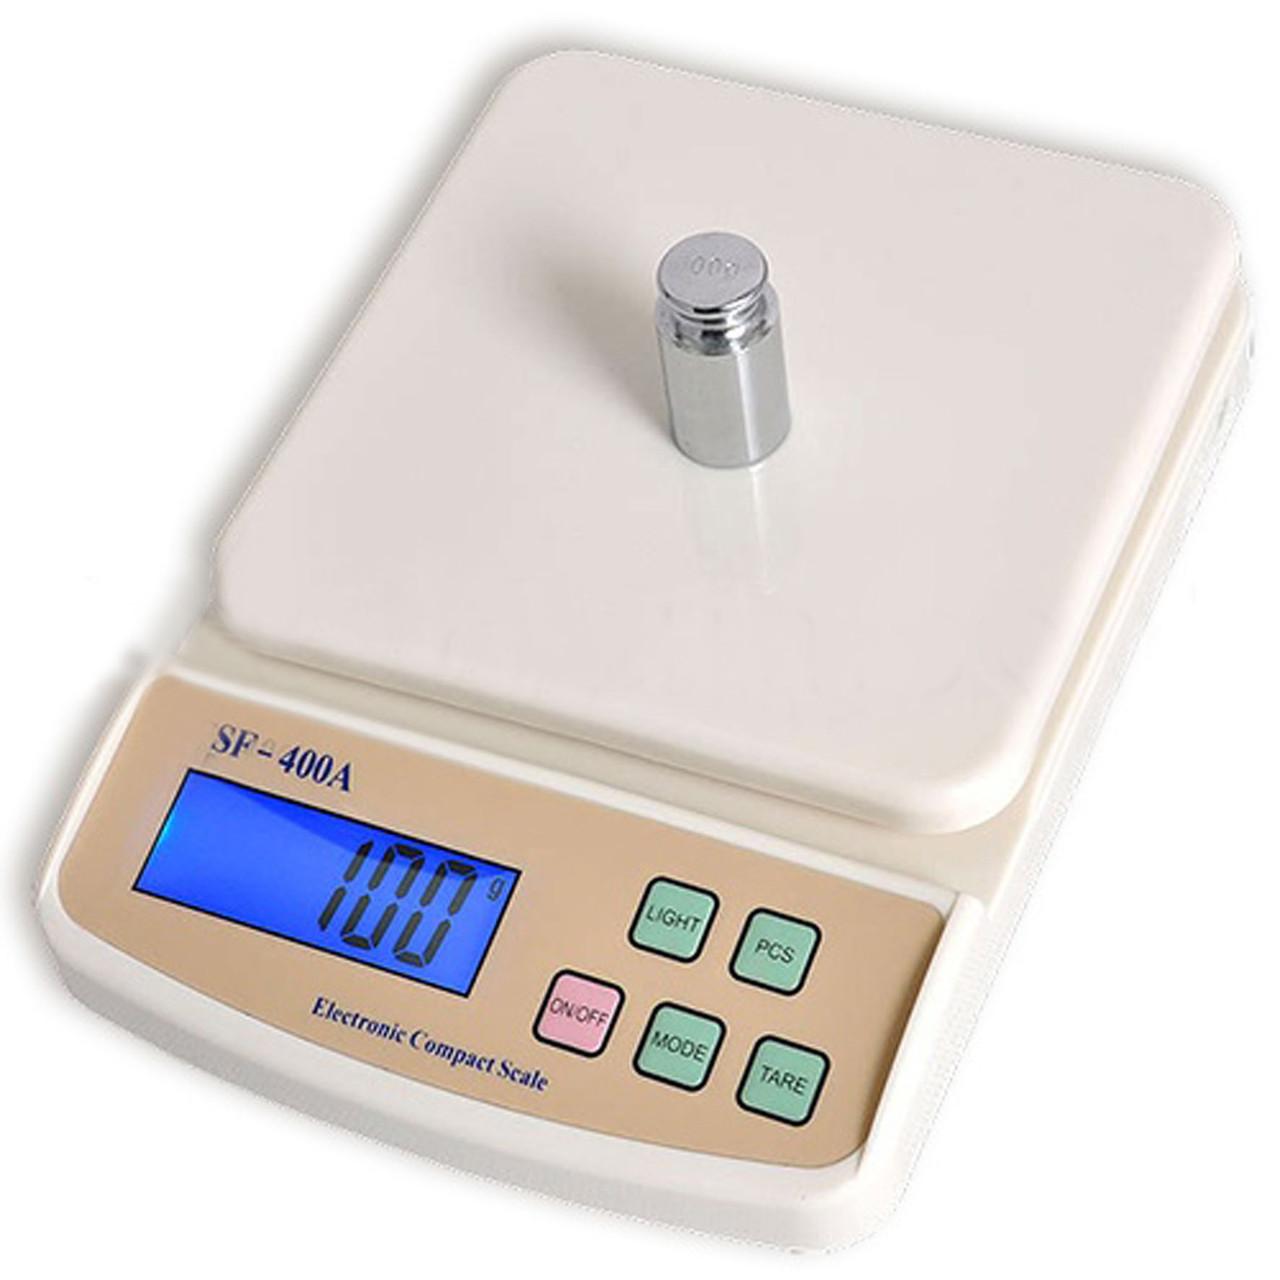 Весы кухонные электронные SF 400A, 7кг/10 кг /6103 (электронные весы)